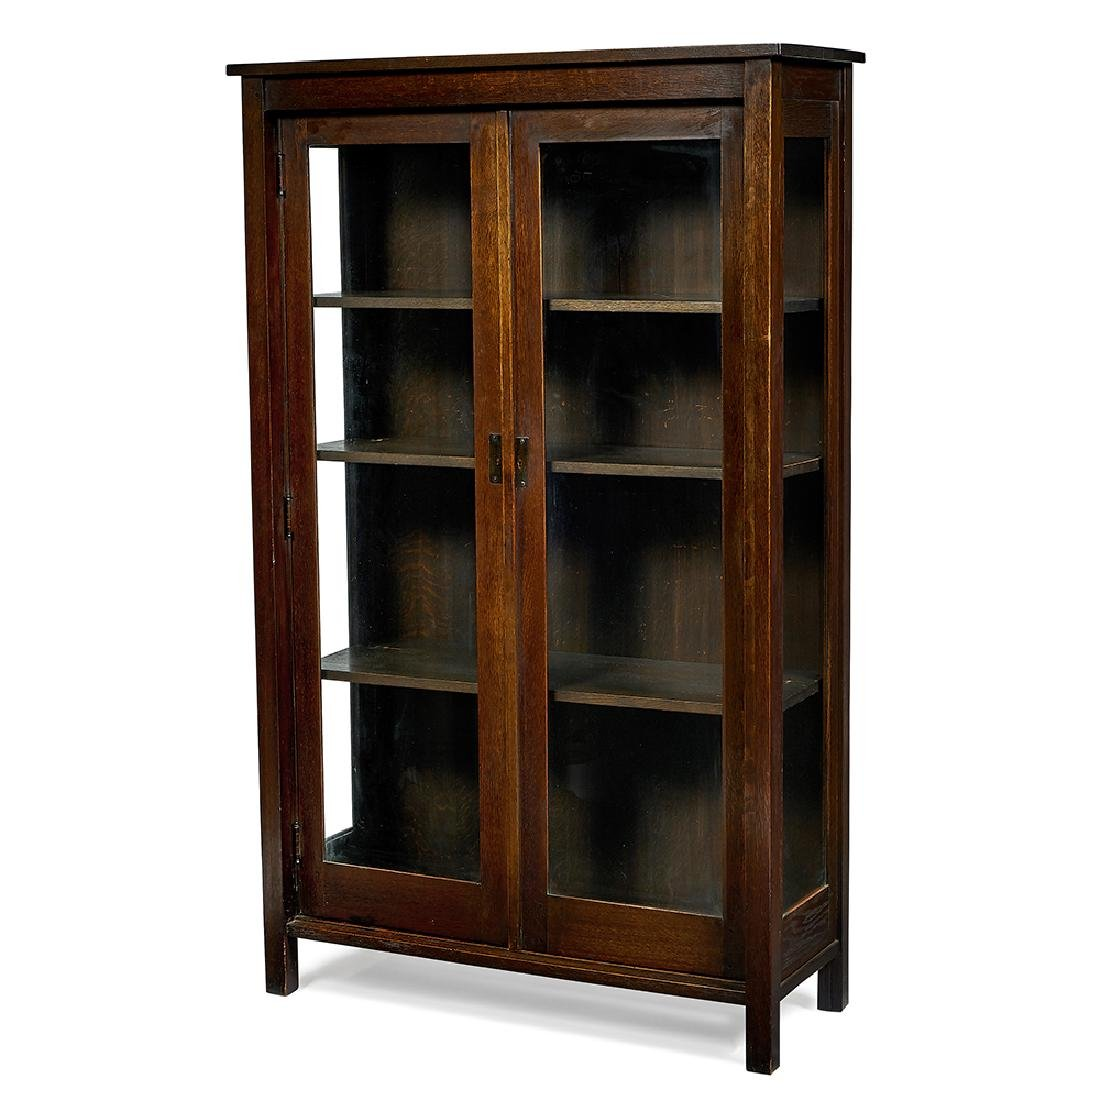 L. & J.G. Stickley china closet (cabinet)